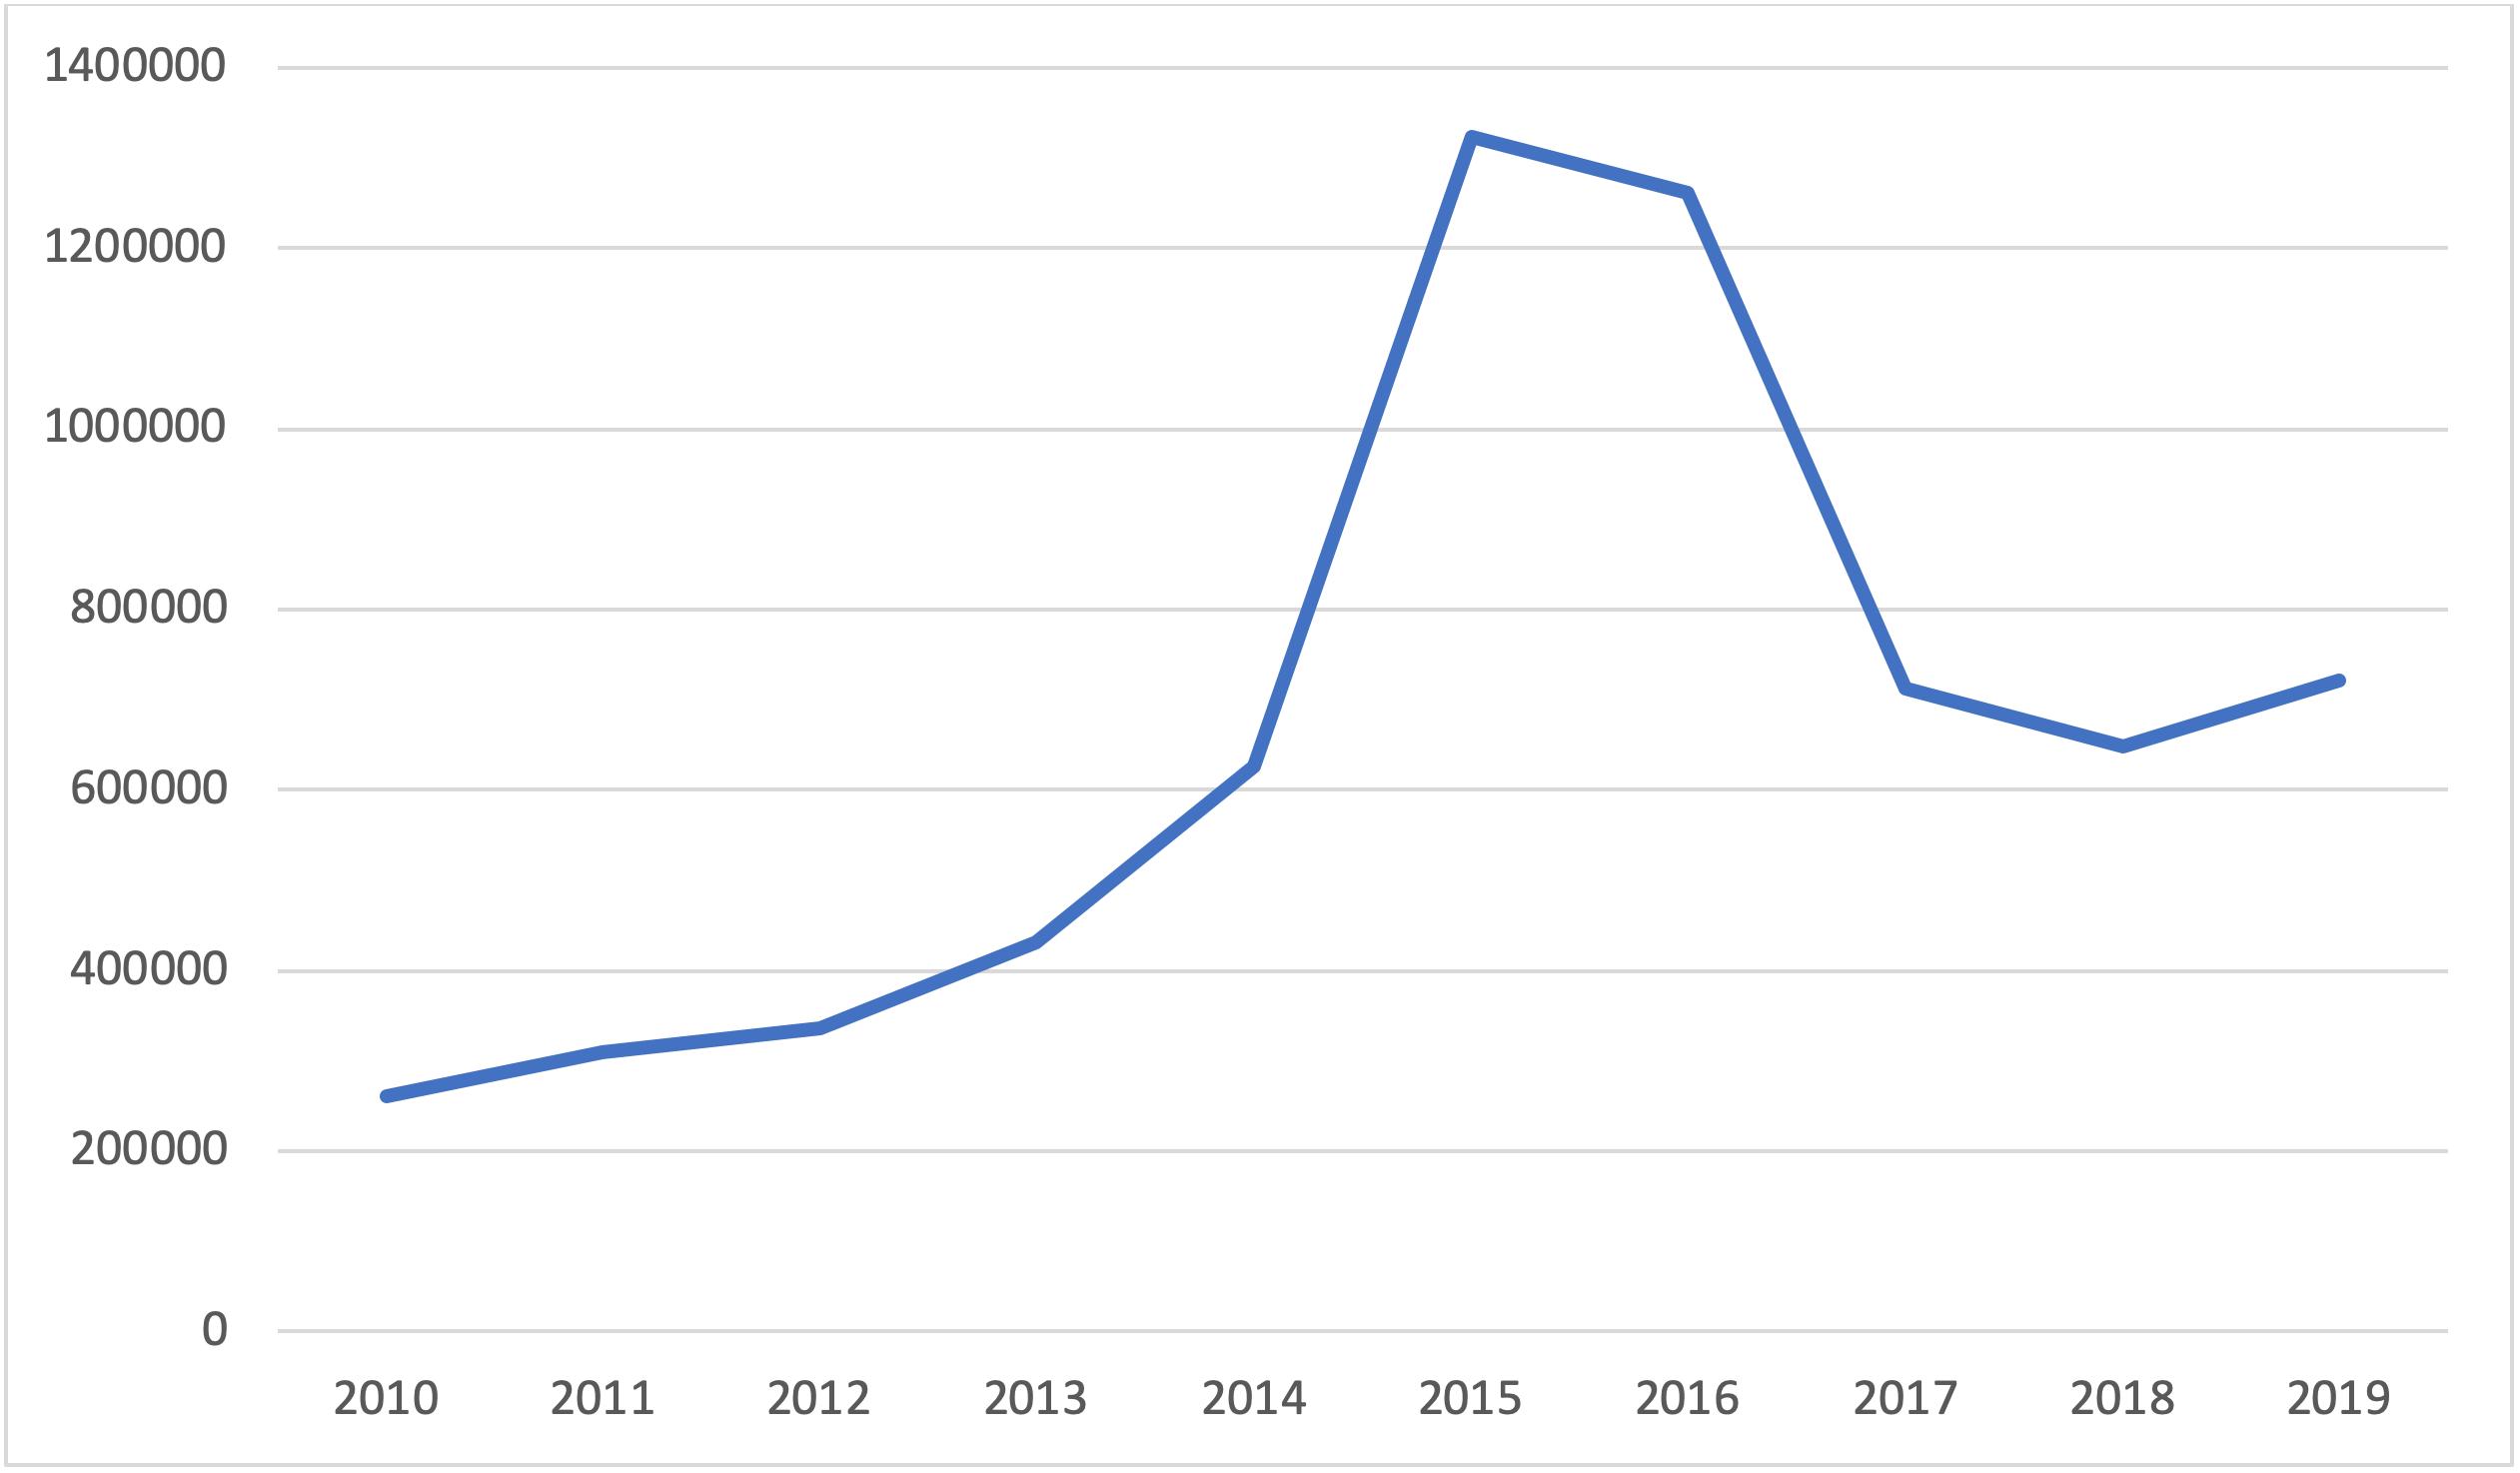 New asylum applicants to the EU, annual aggregated data, 2010-2019